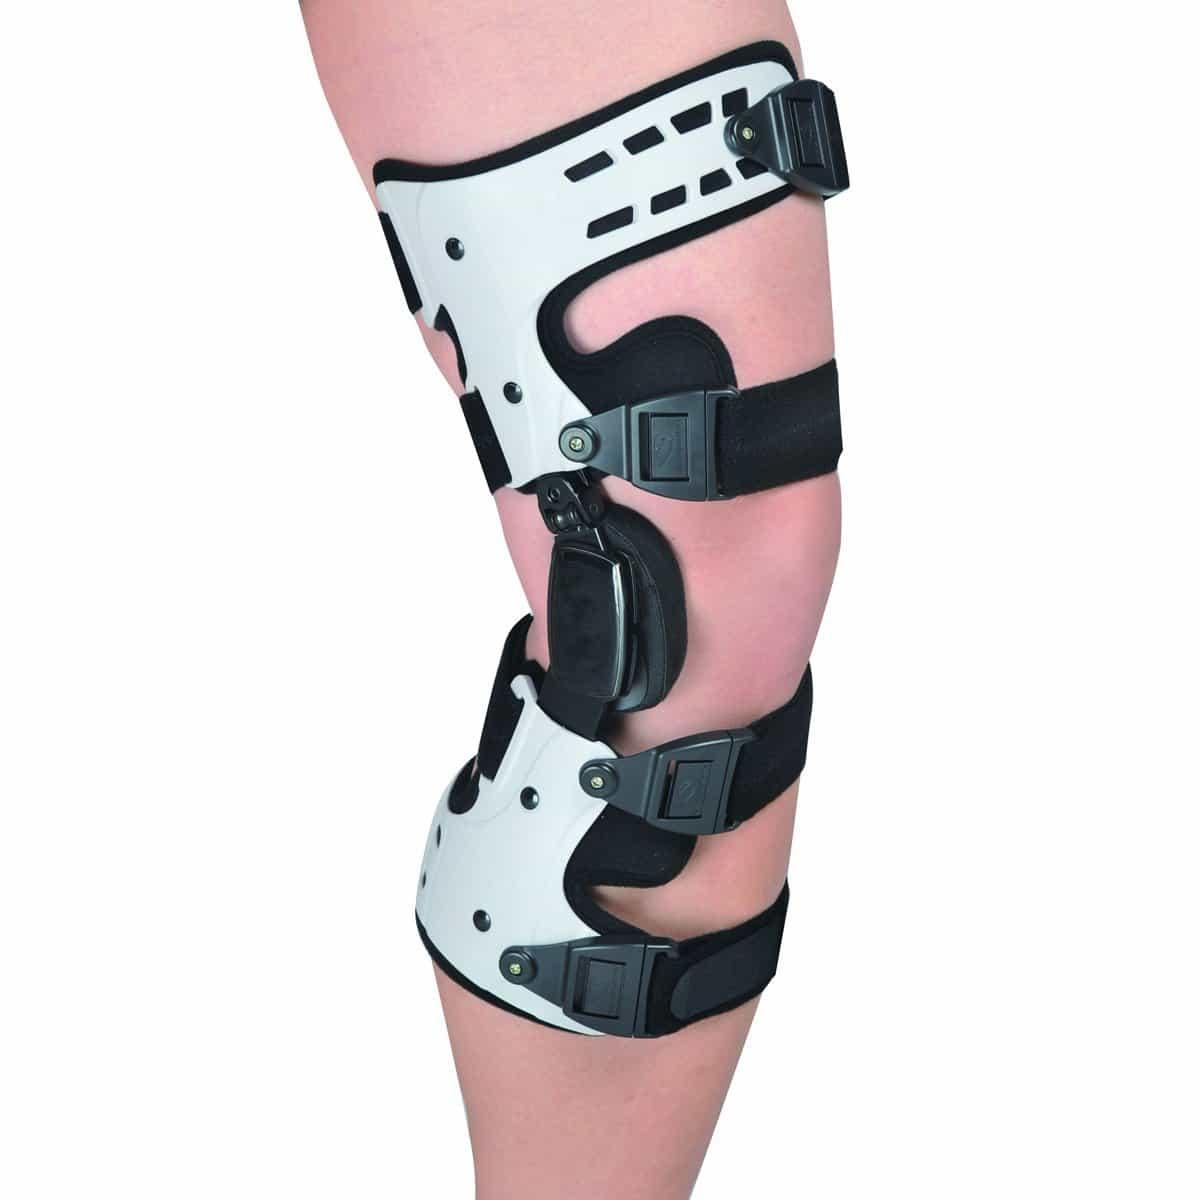 Orthomen medical osteoarthritis knee brace